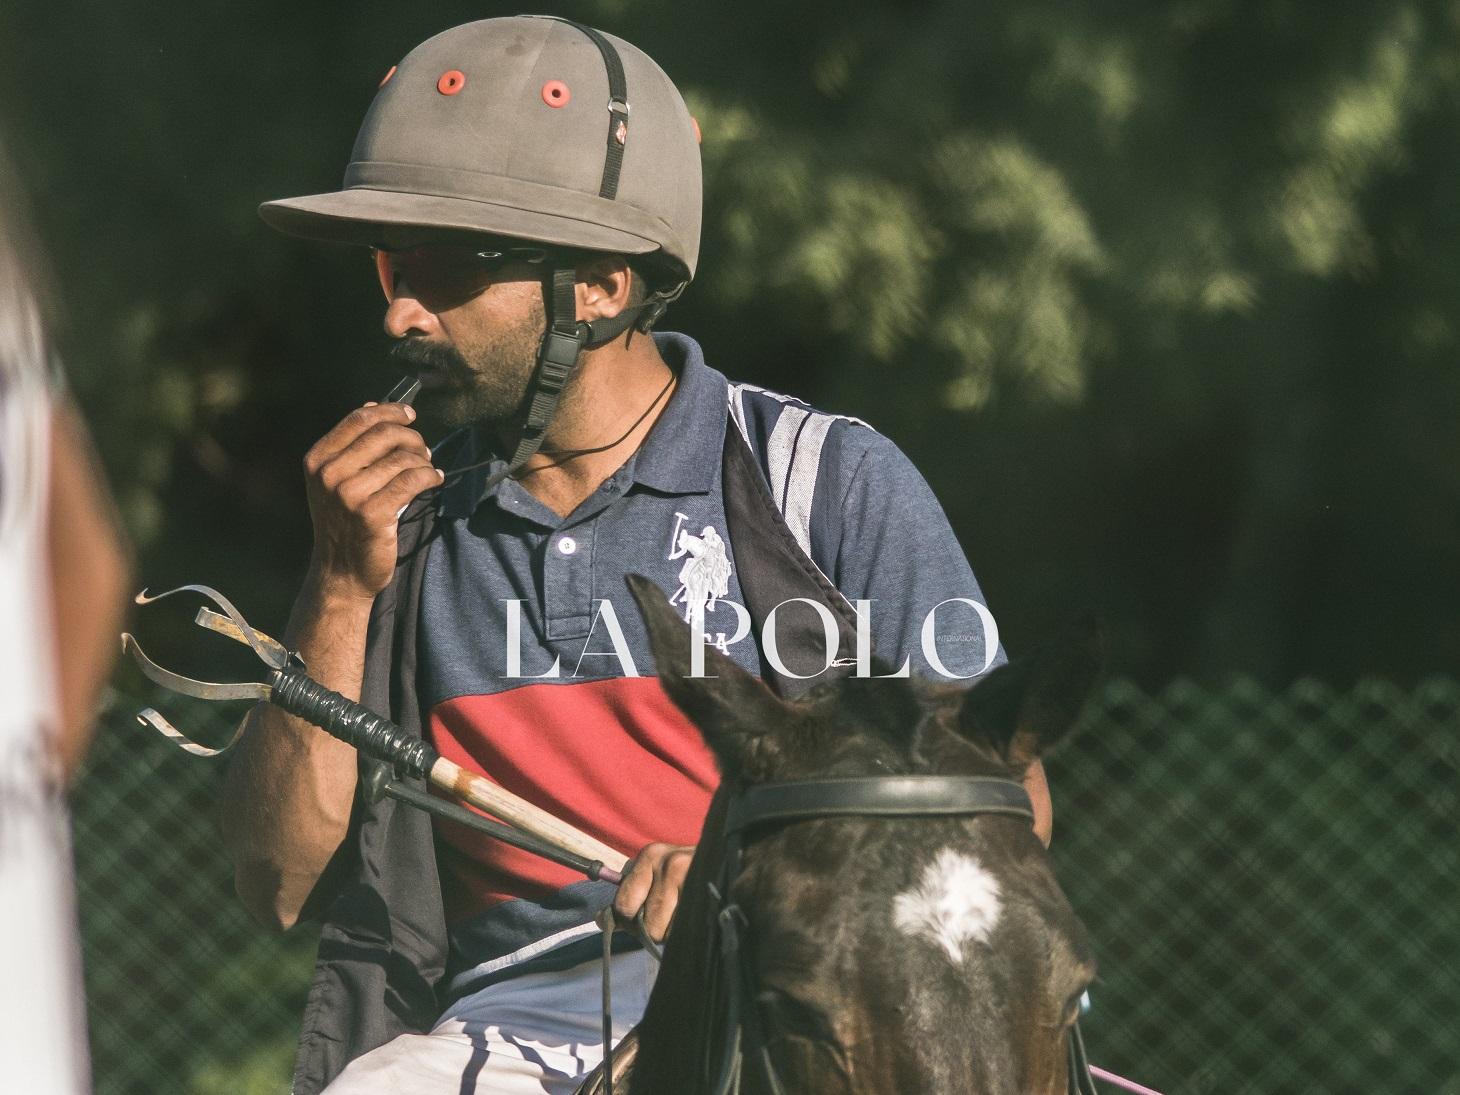 umpiring-in-india-professional-umpires-for-polo-lapolo